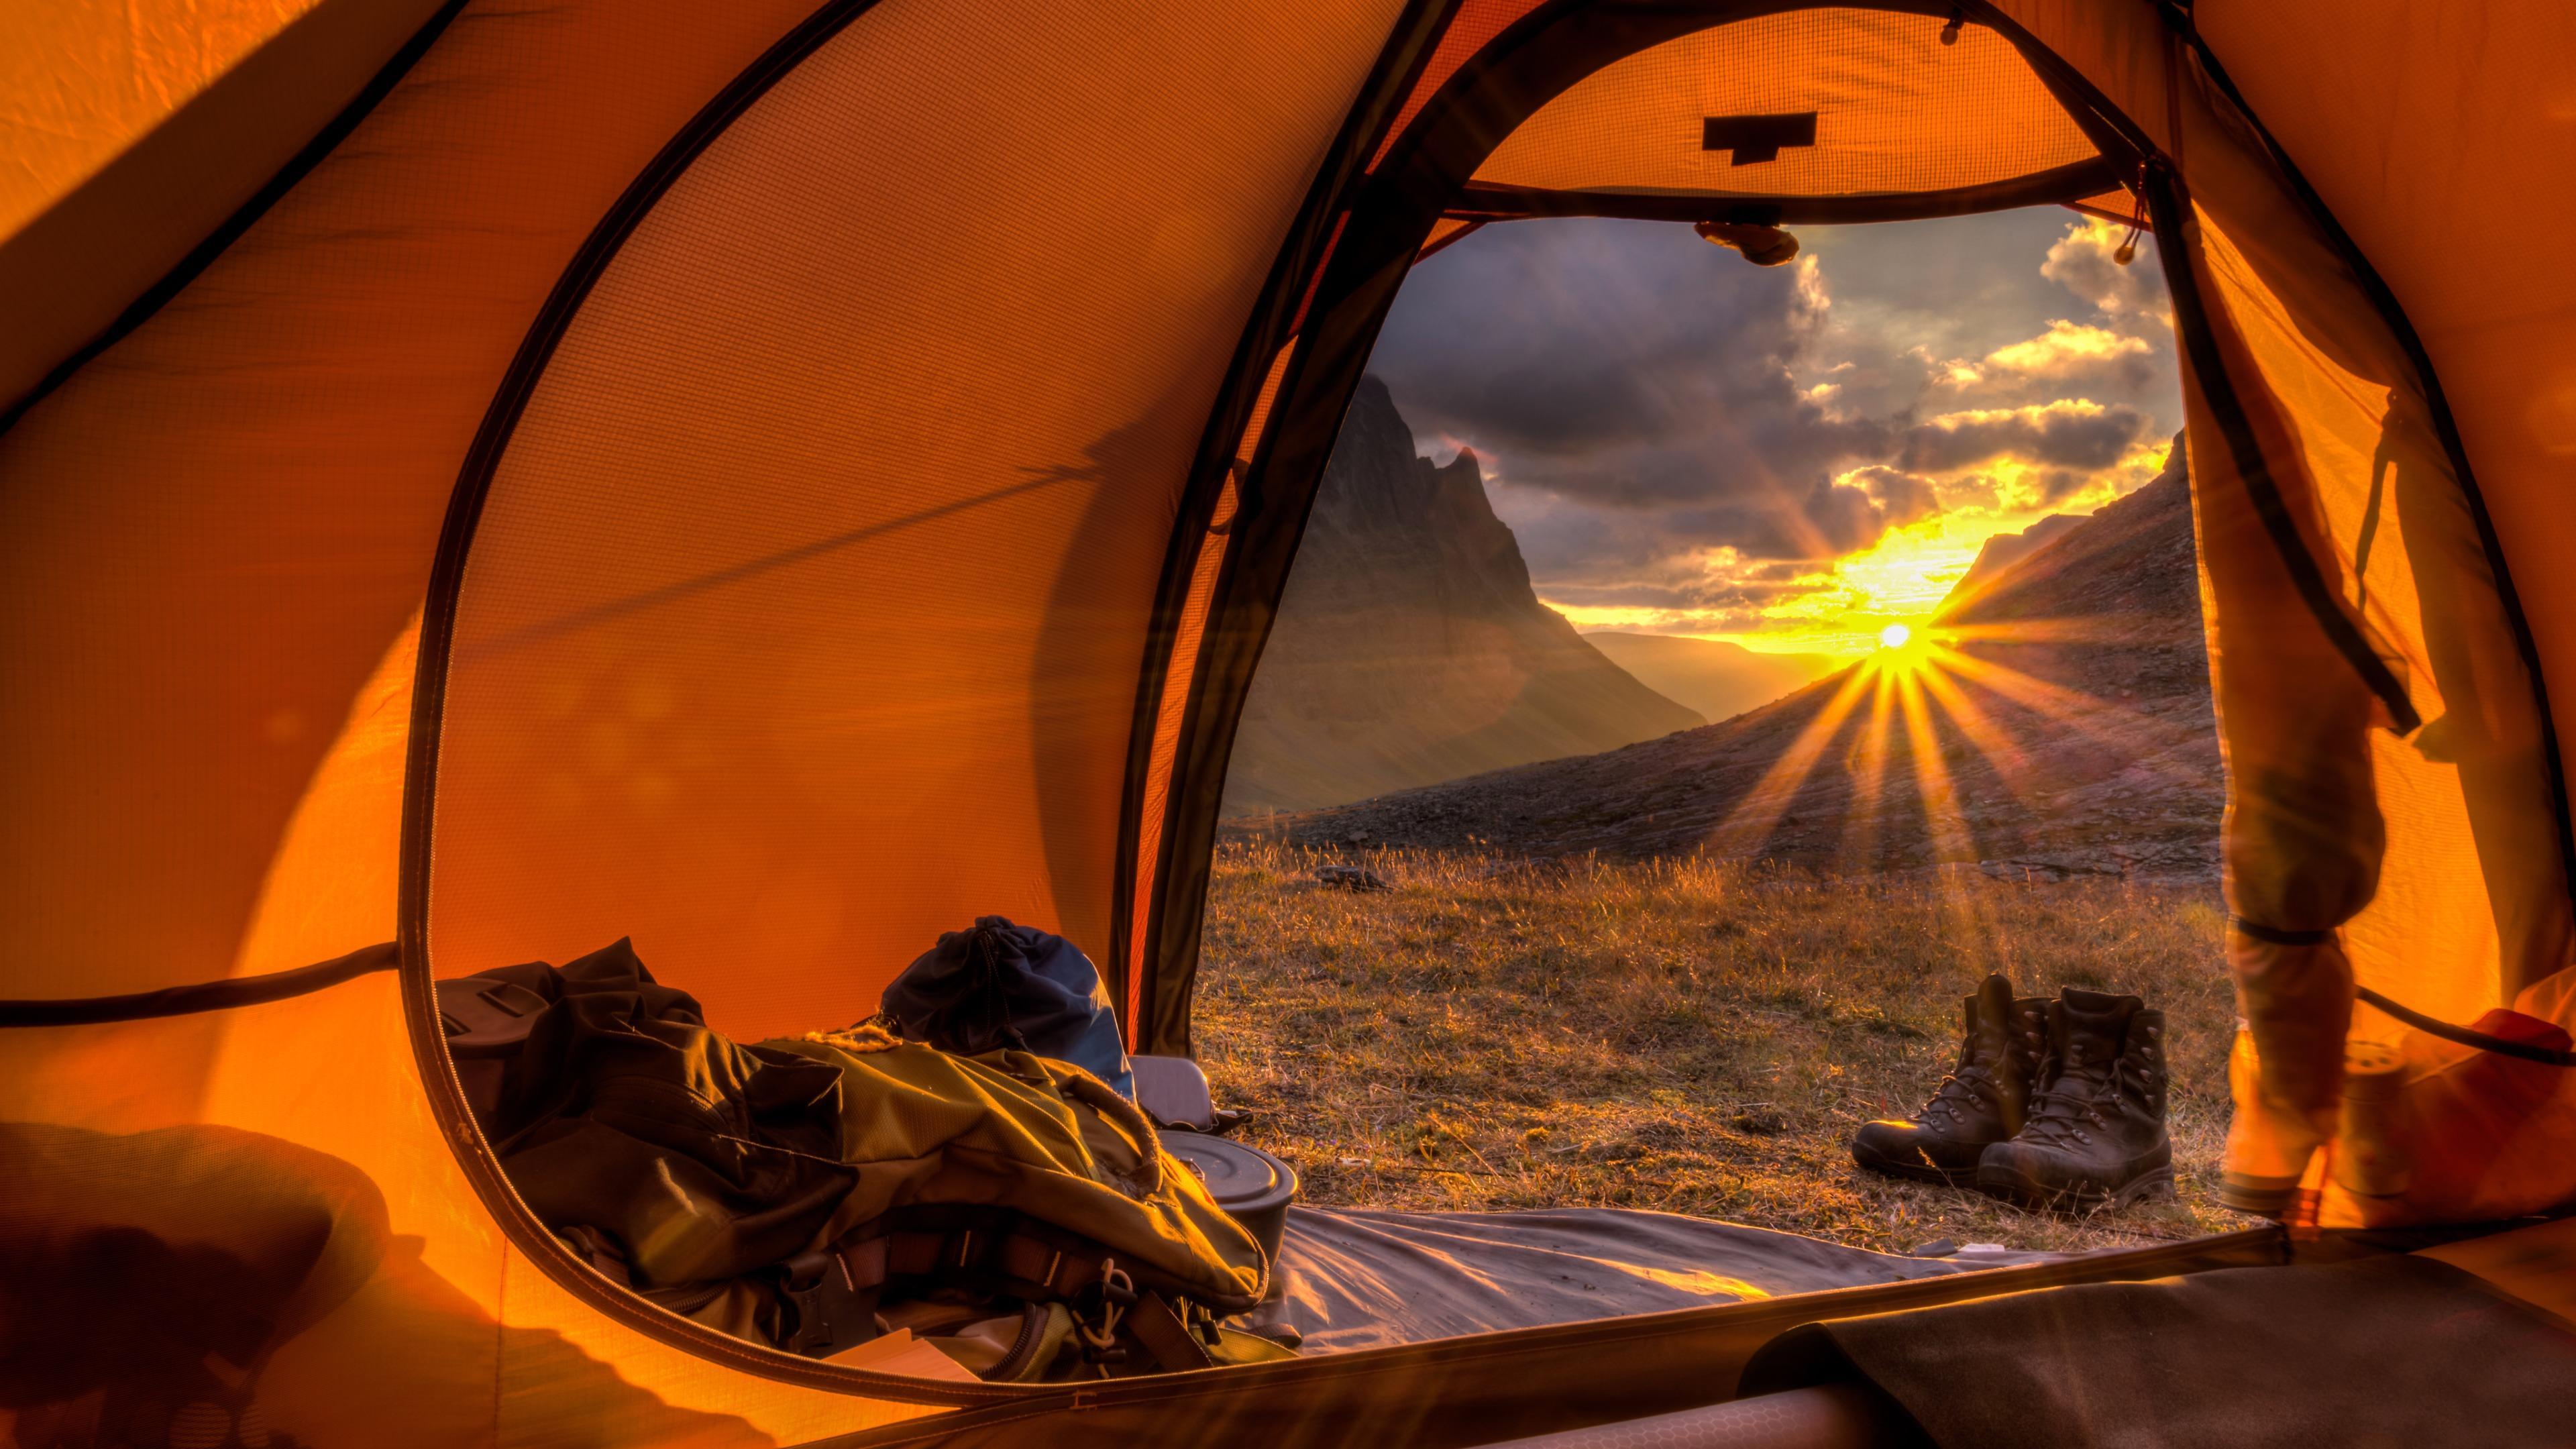 Tent sunlight wallpaper